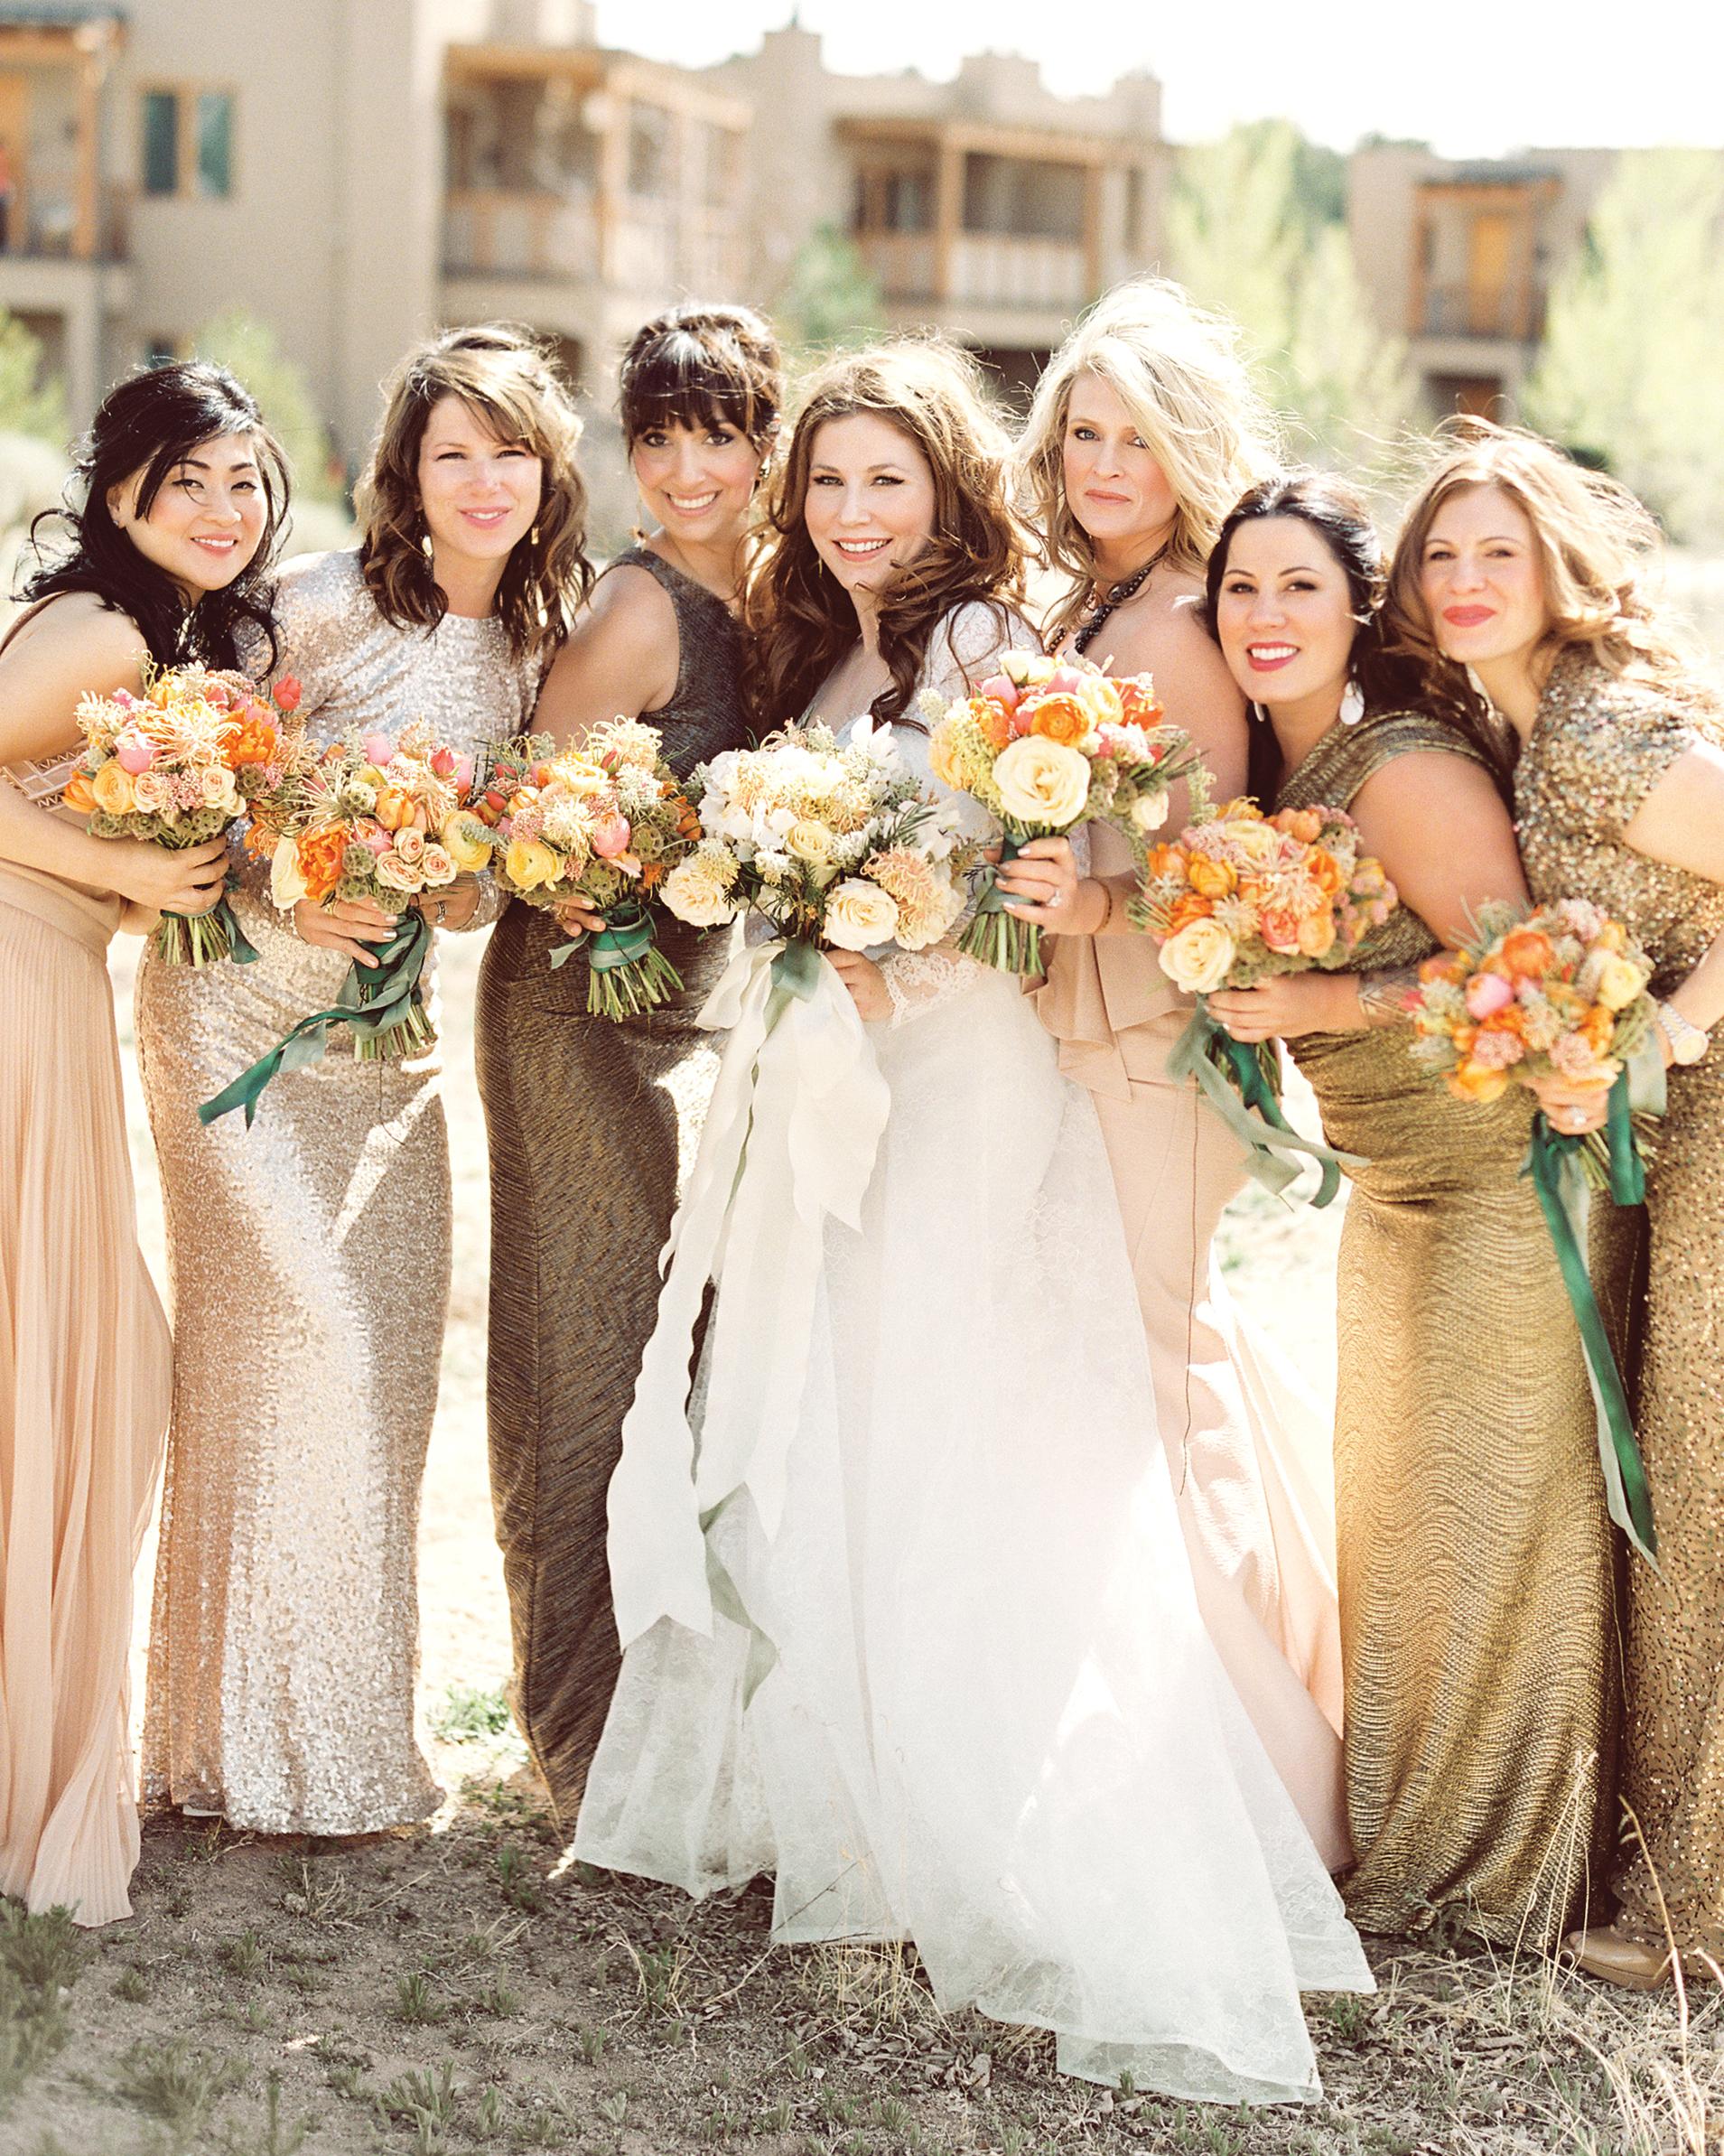 katherine-jared-wedding-0456-ds111387.jpg